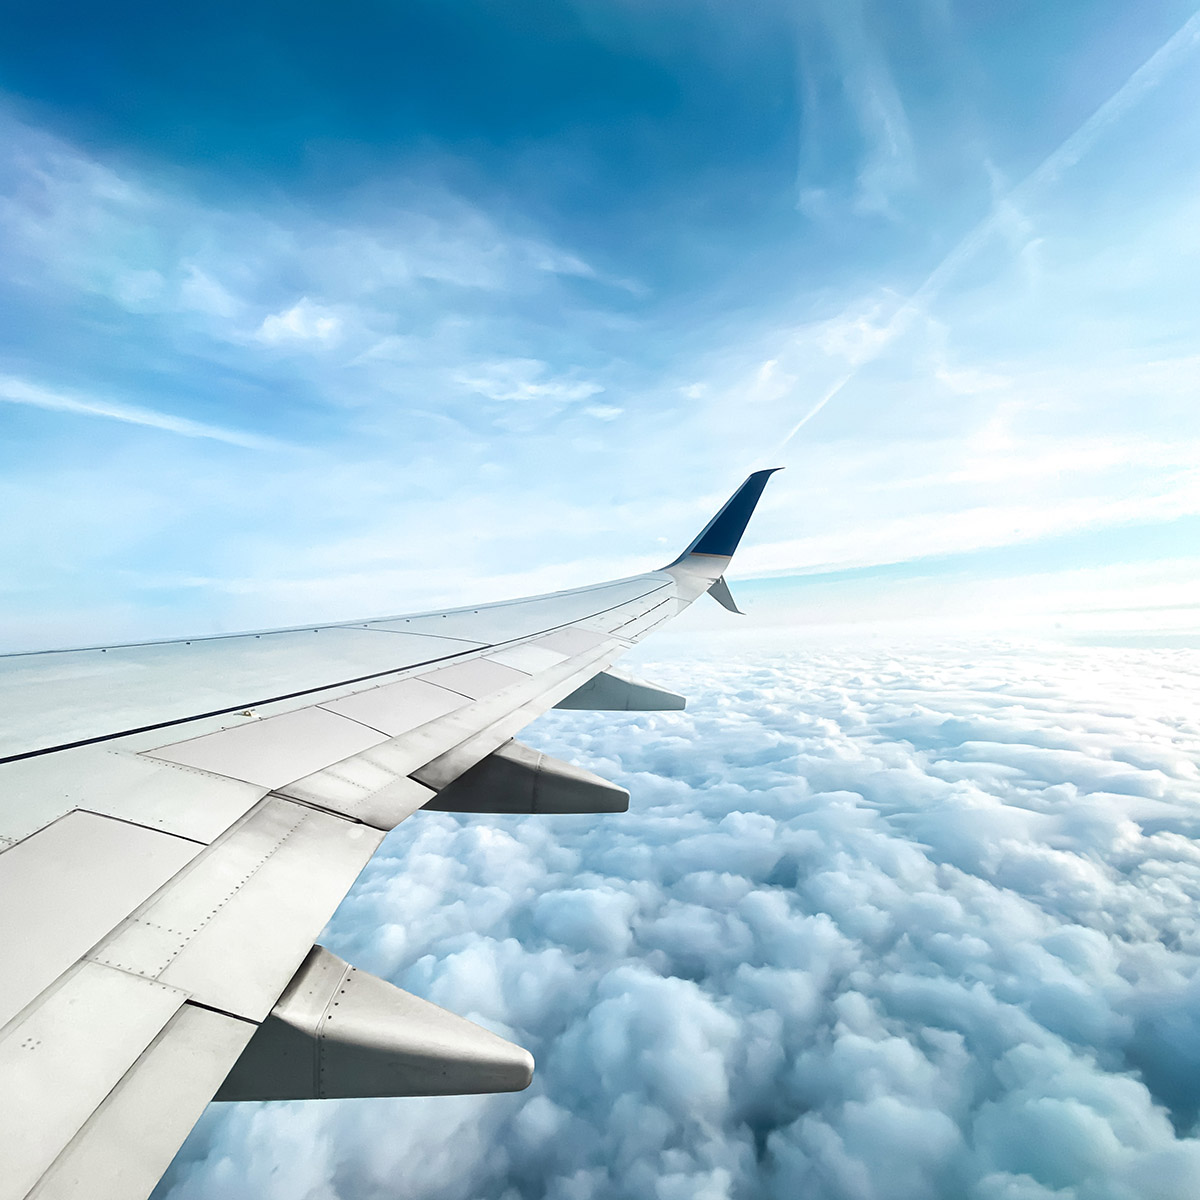 2021 Travel Tips - Flexible Options